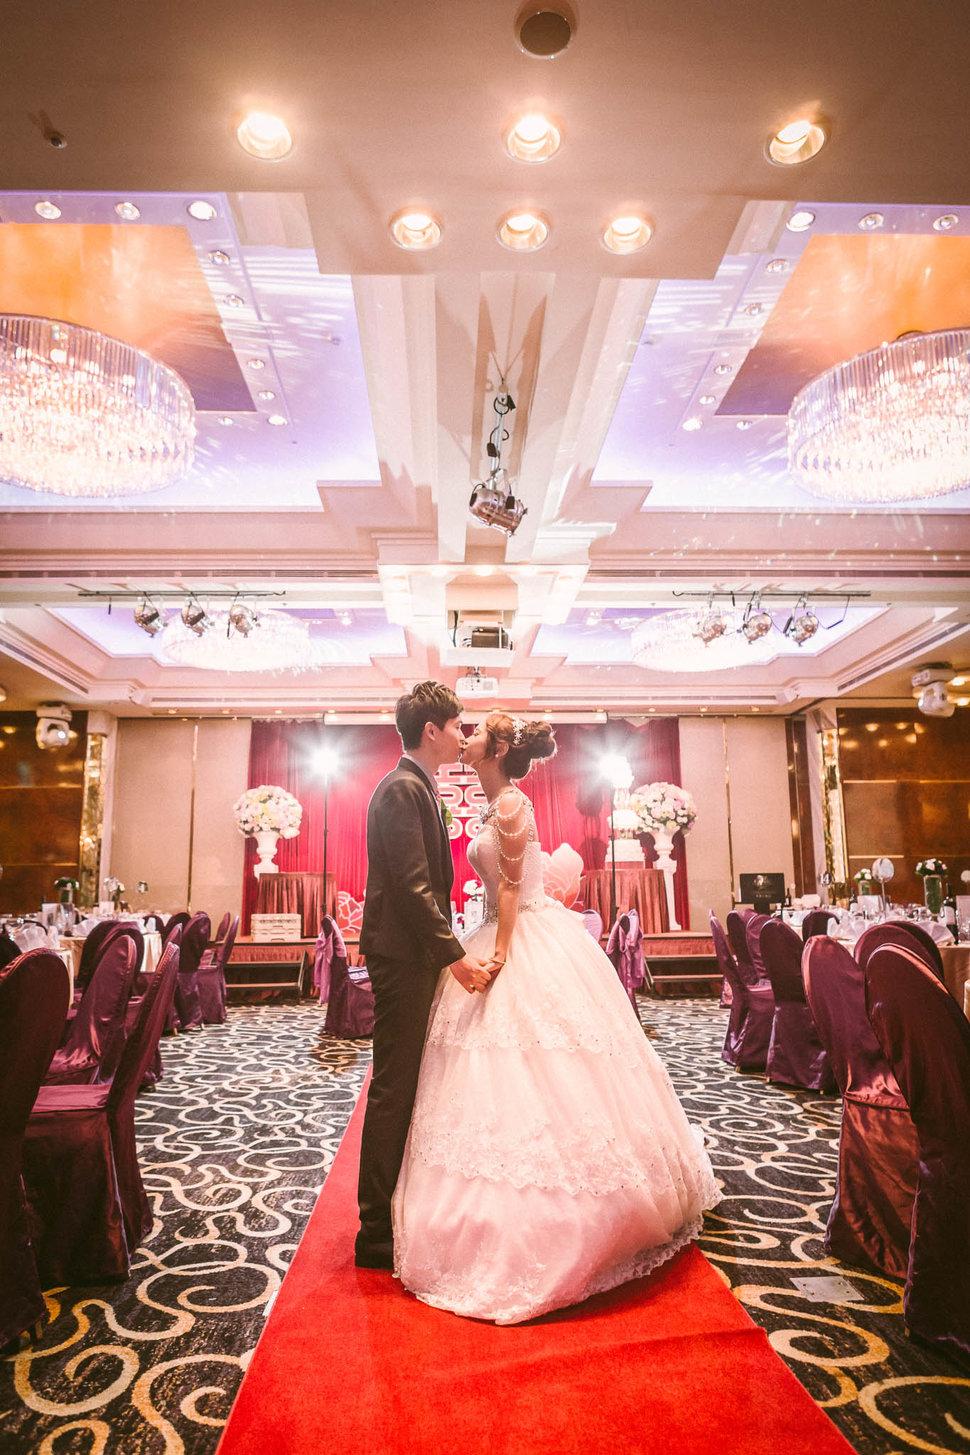 18PHOTO-TIM❤️ ROSA 結婚(編號:308347) - 18PHOTO 婚紗影像攝影工作室 - 結婚吧